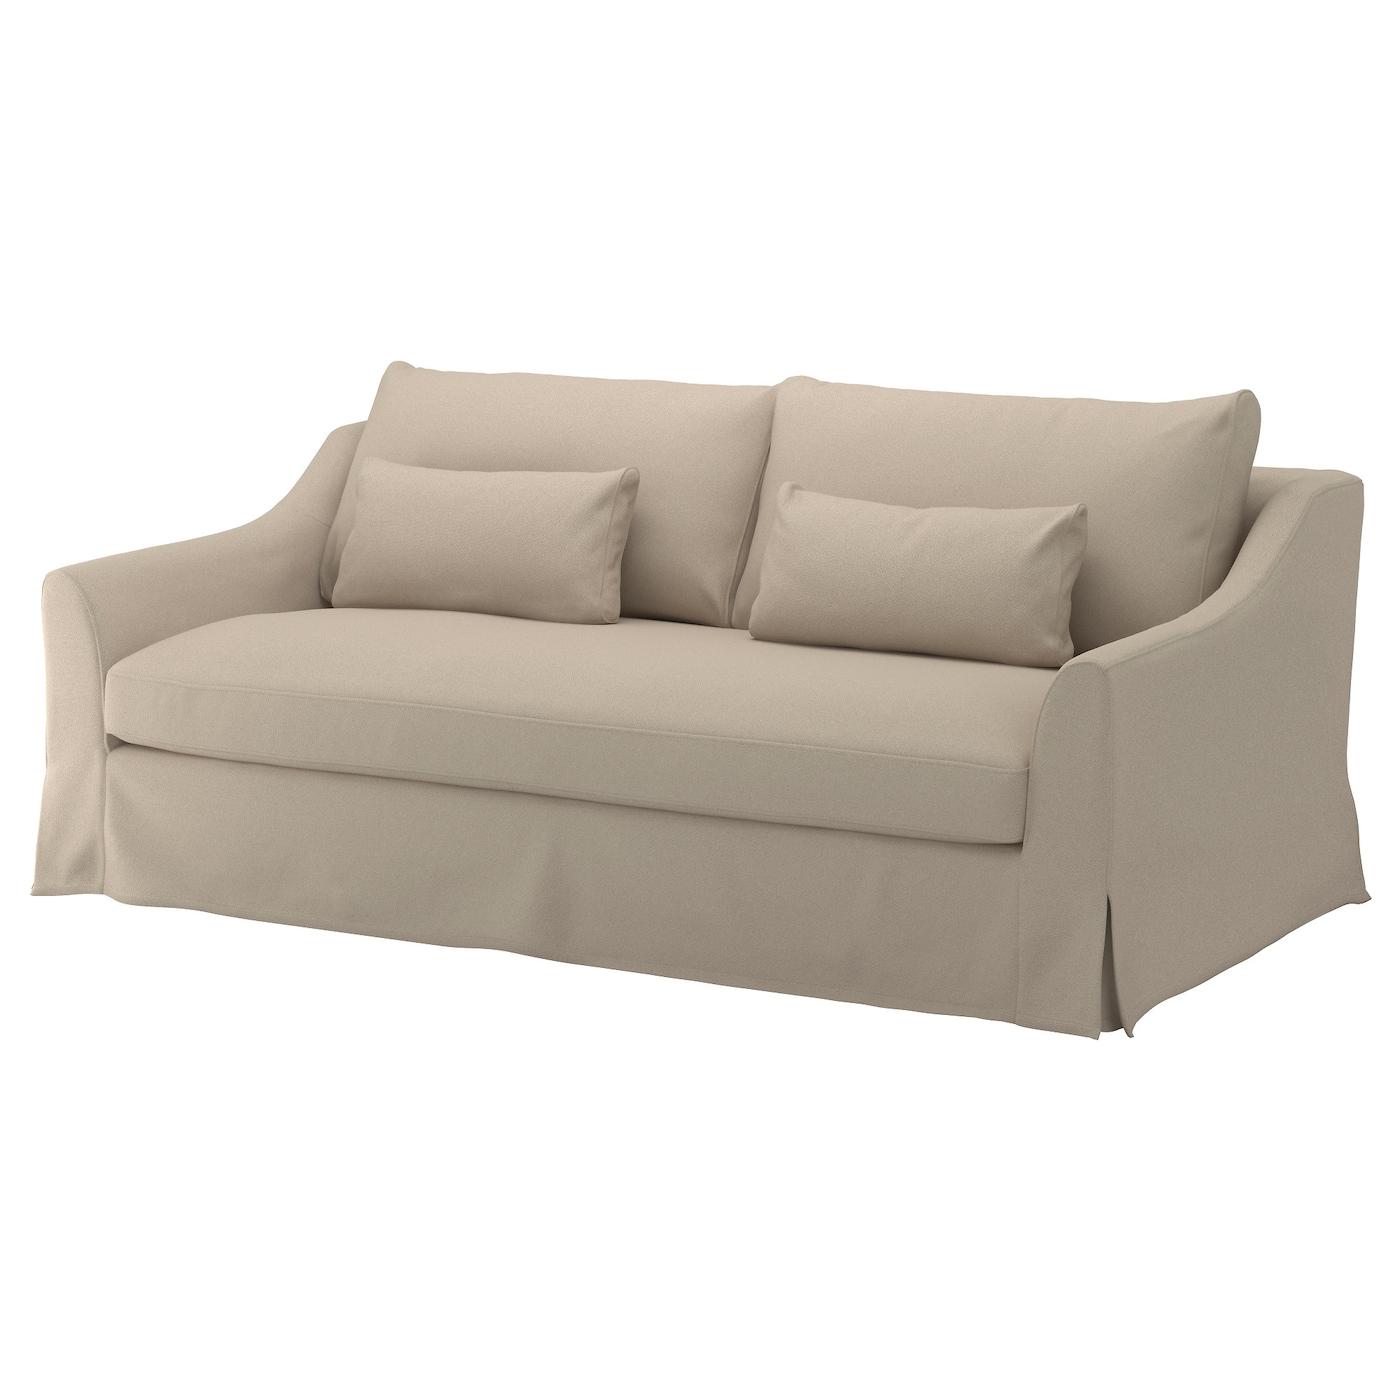 Ikea FÄrlÖv Cover For 3 Seat Sofa